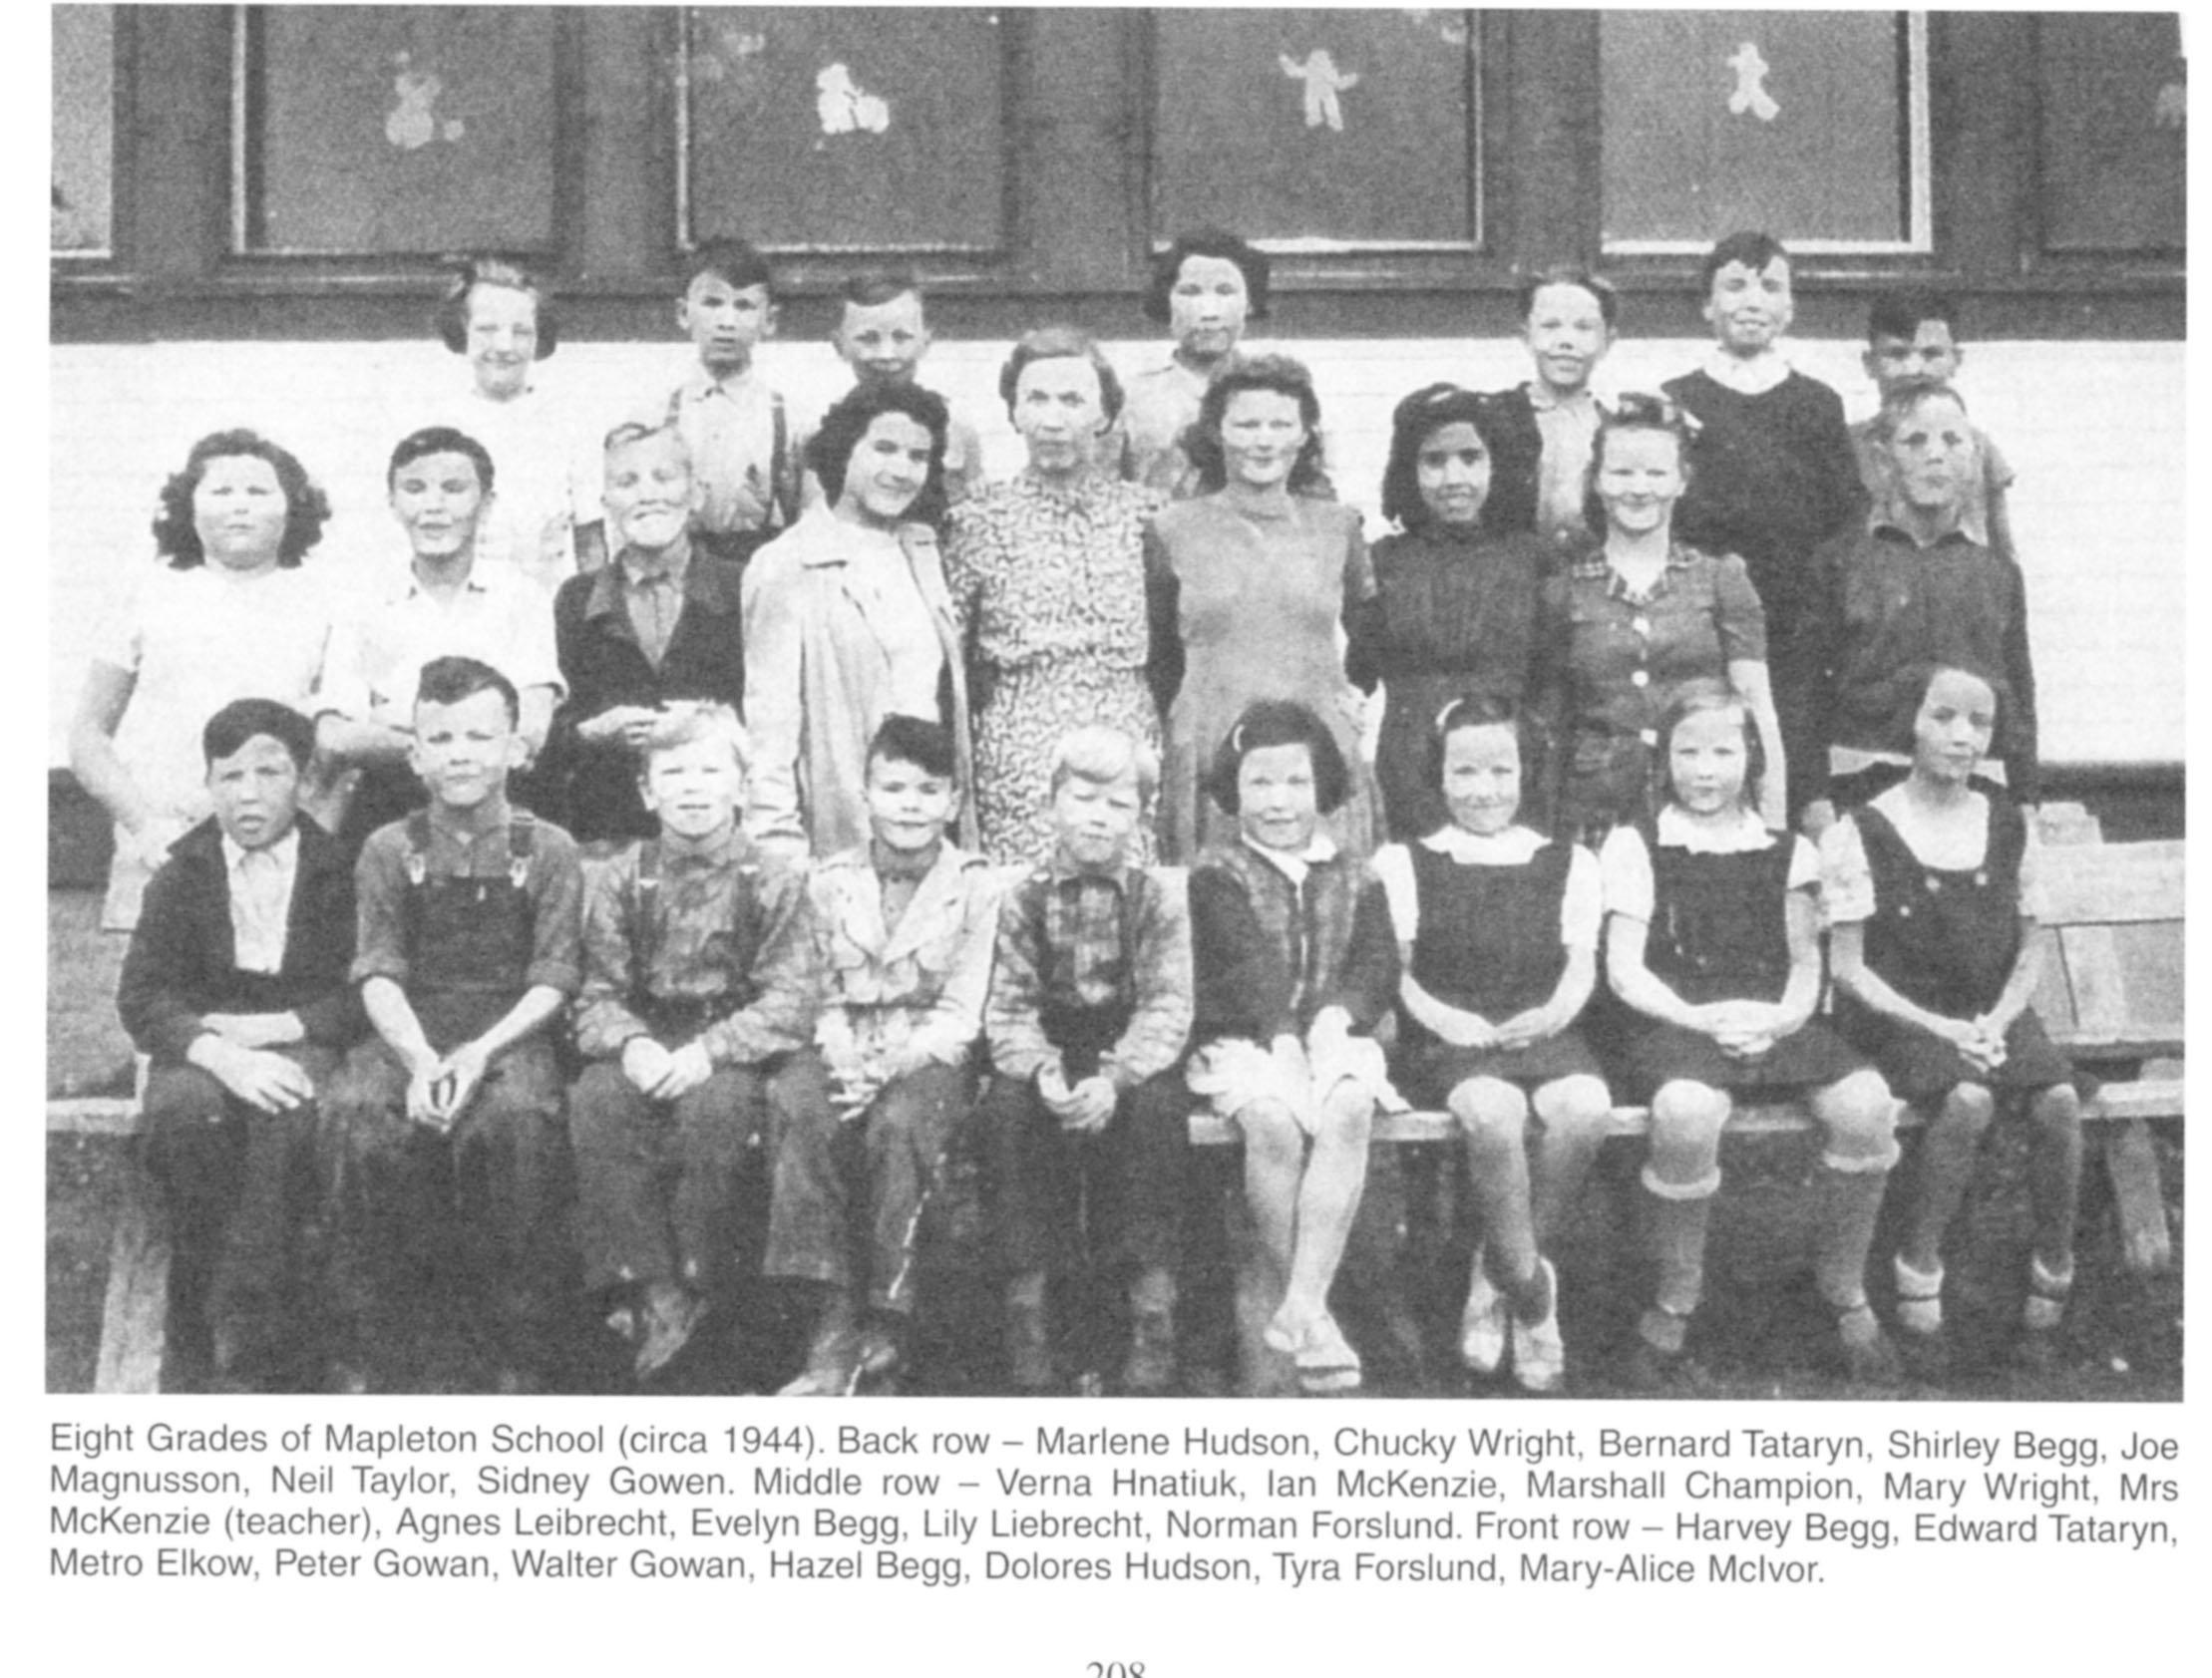 Mapleton School 8 grades 1944